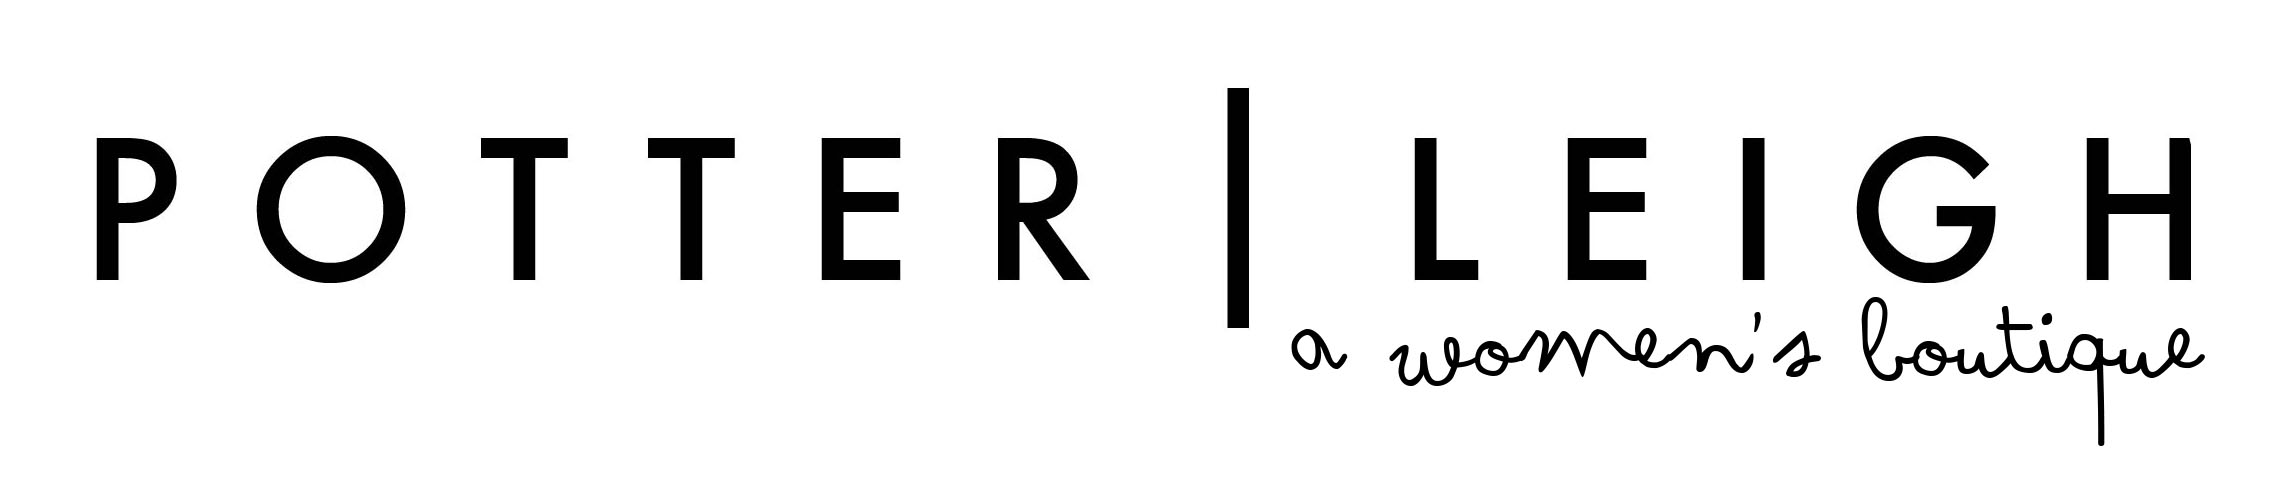 Potter Leigh Logo-01A.jpg